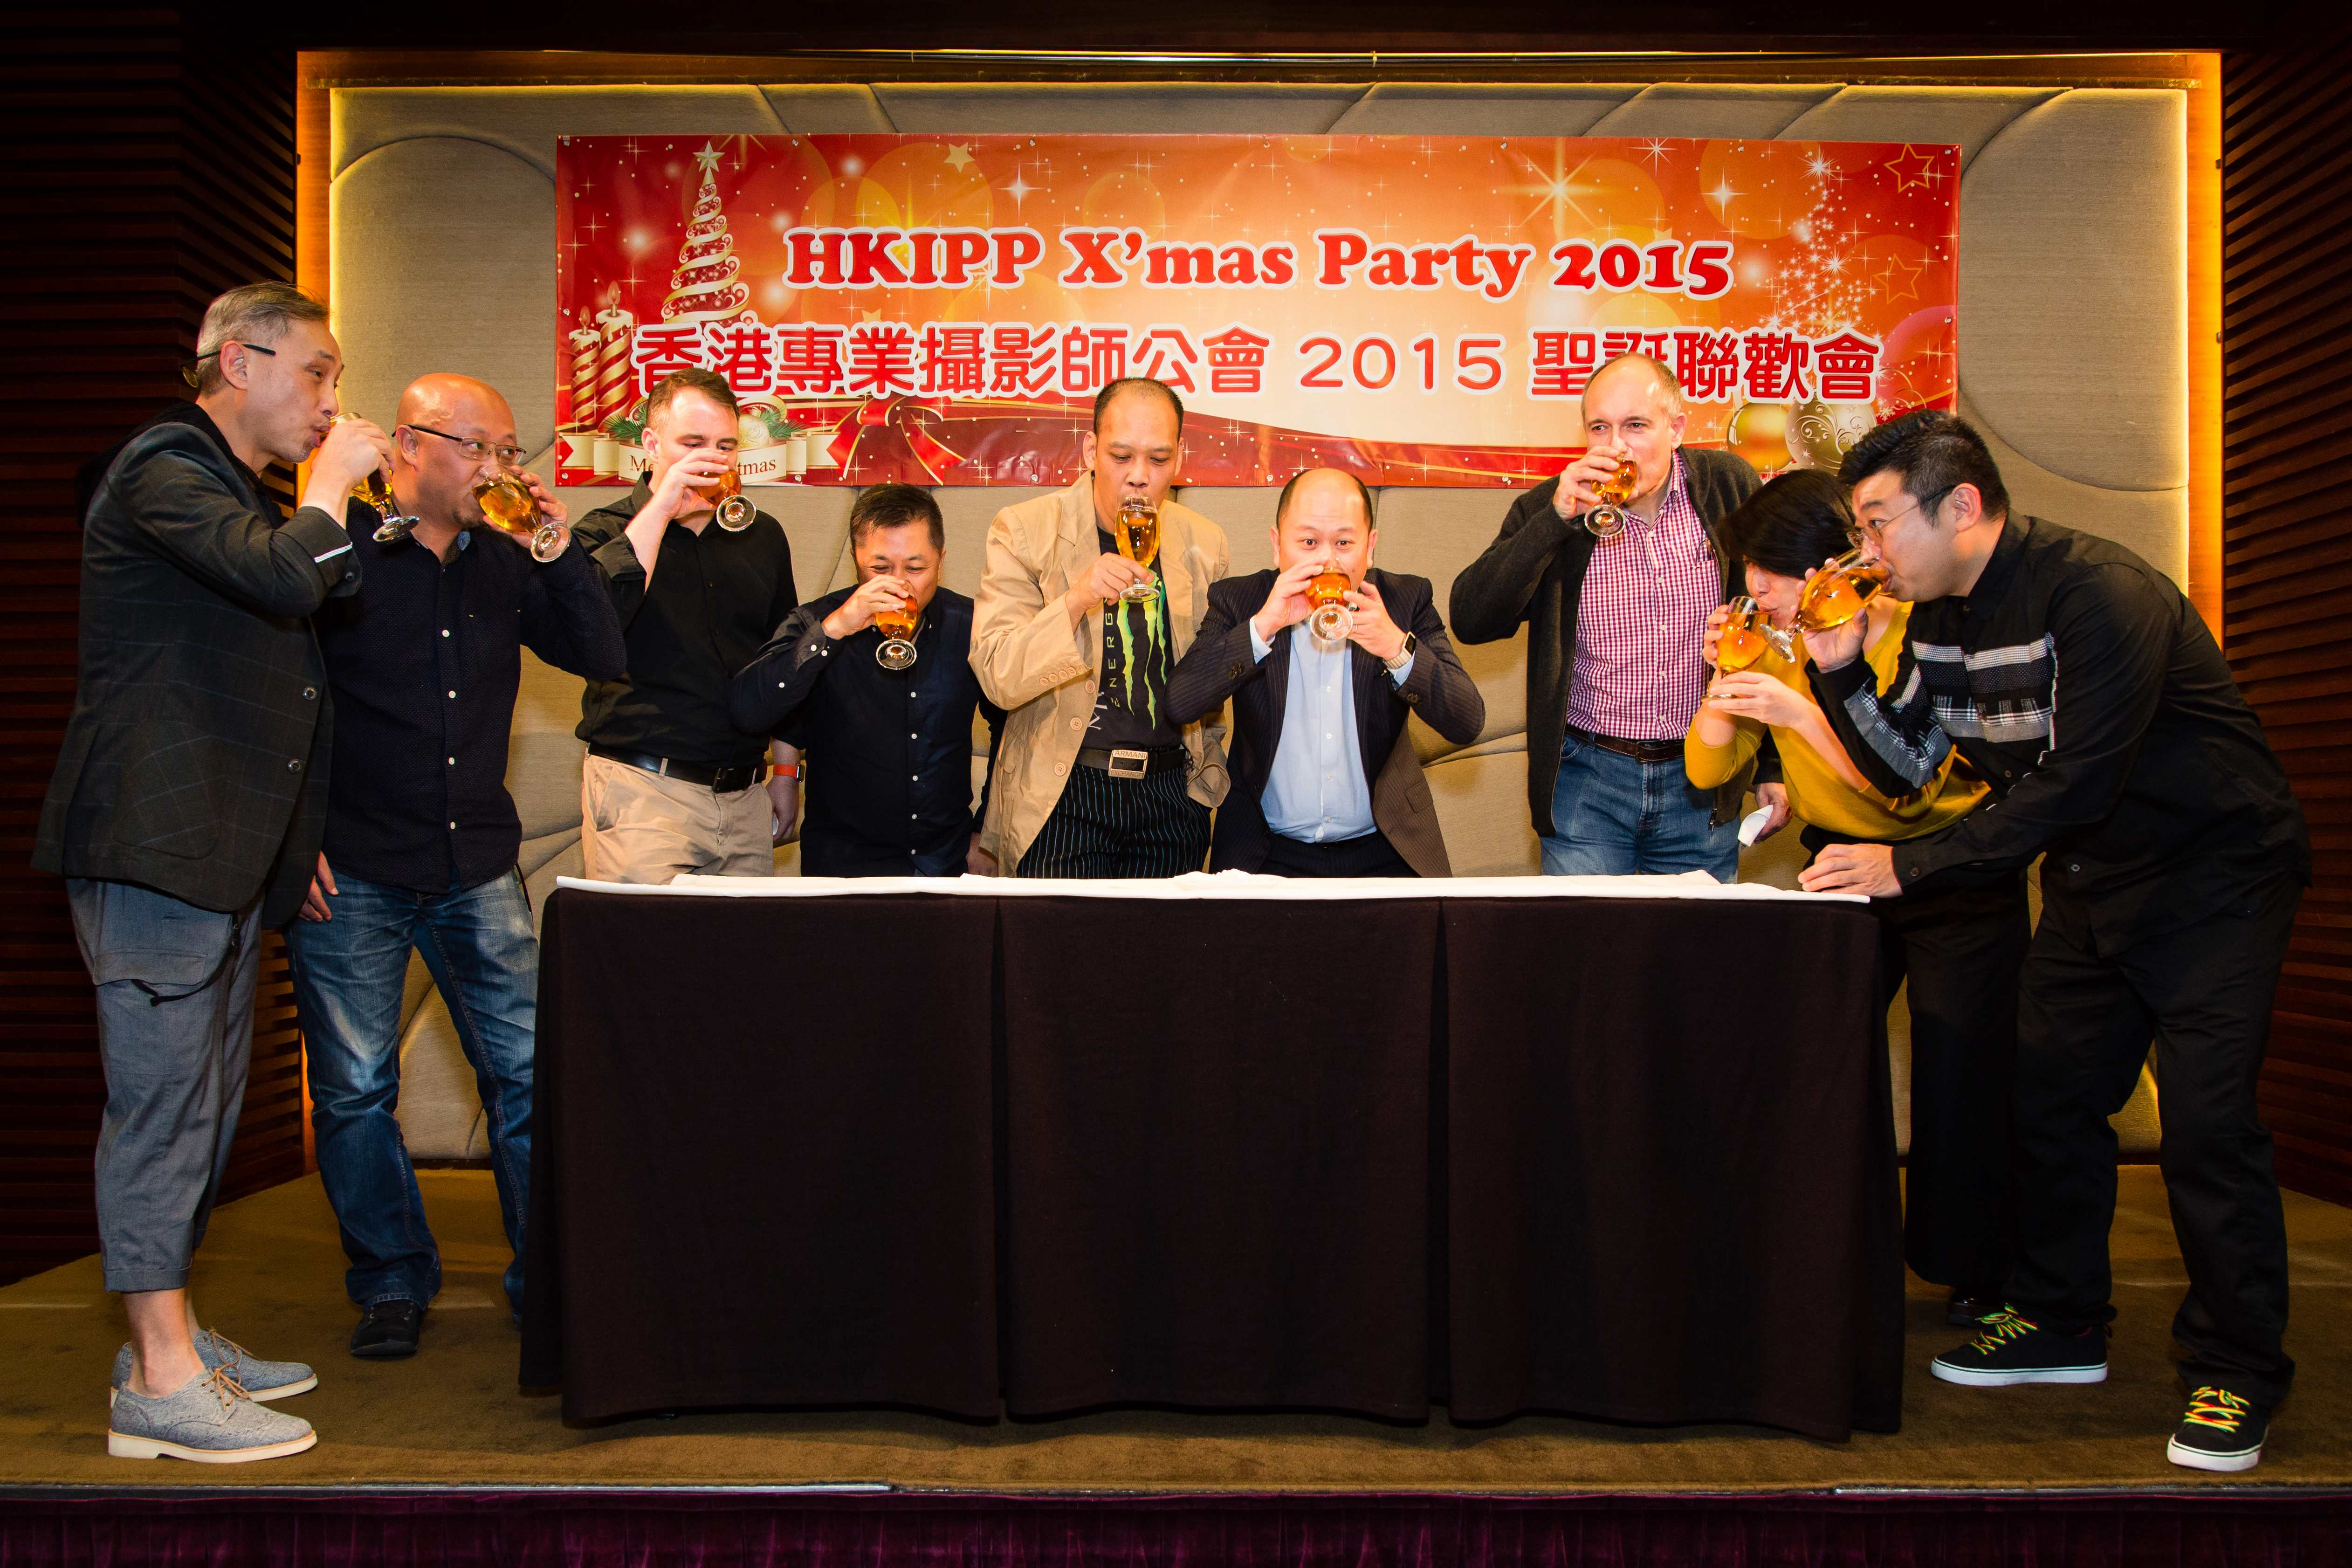 HKIPP X'MASHKIPP2015-0082